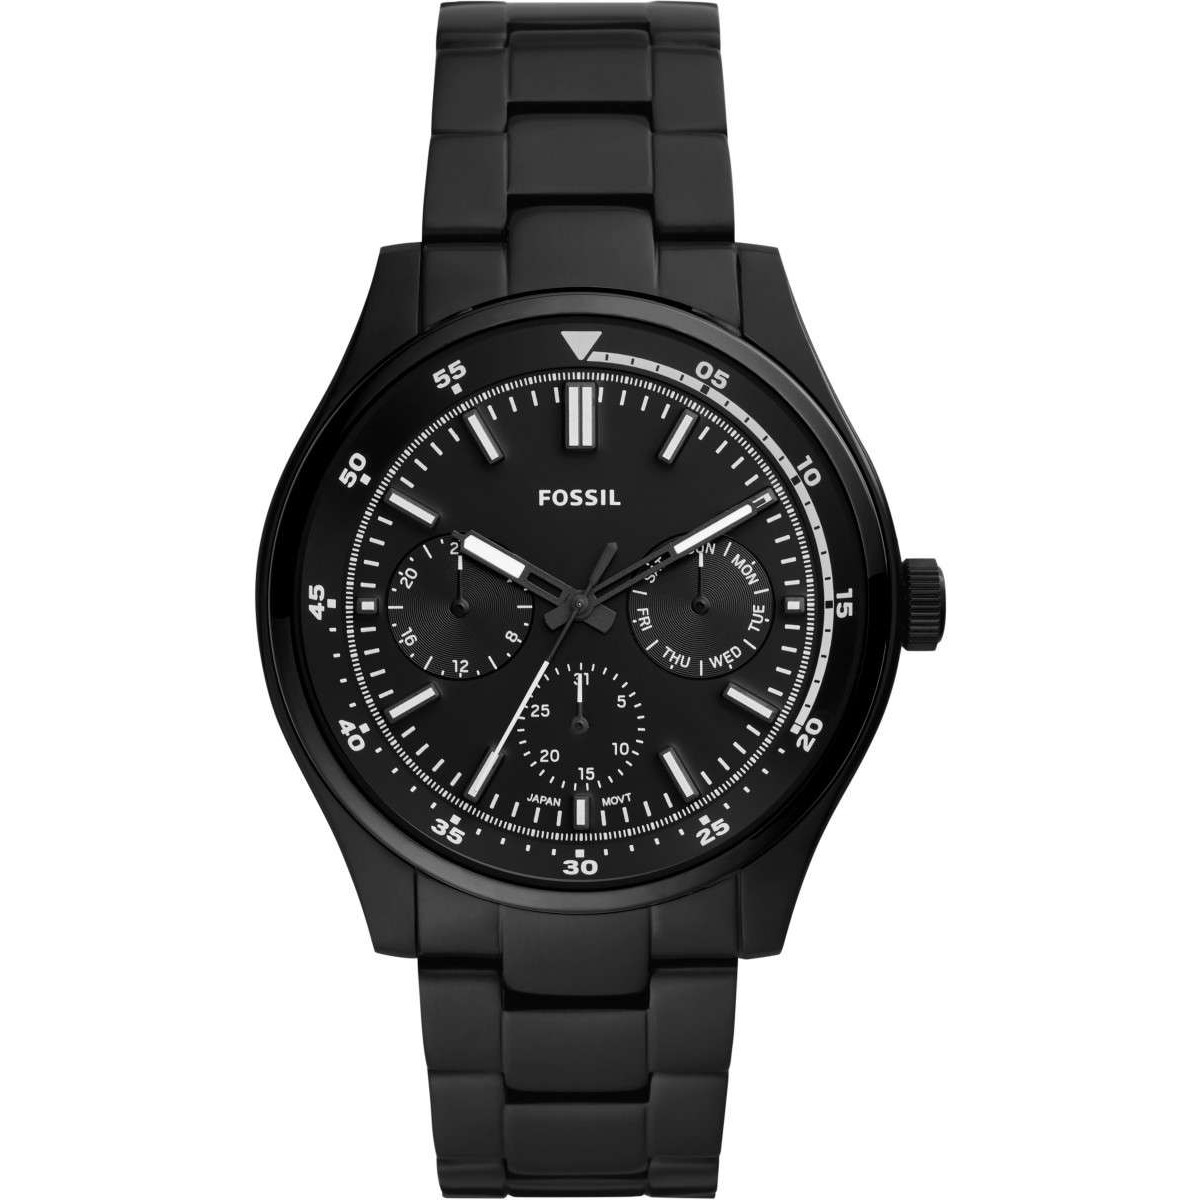 https://www.gaberjoyeria.com/5102-thickbox_default/reloj-fossil-belmar.jpg